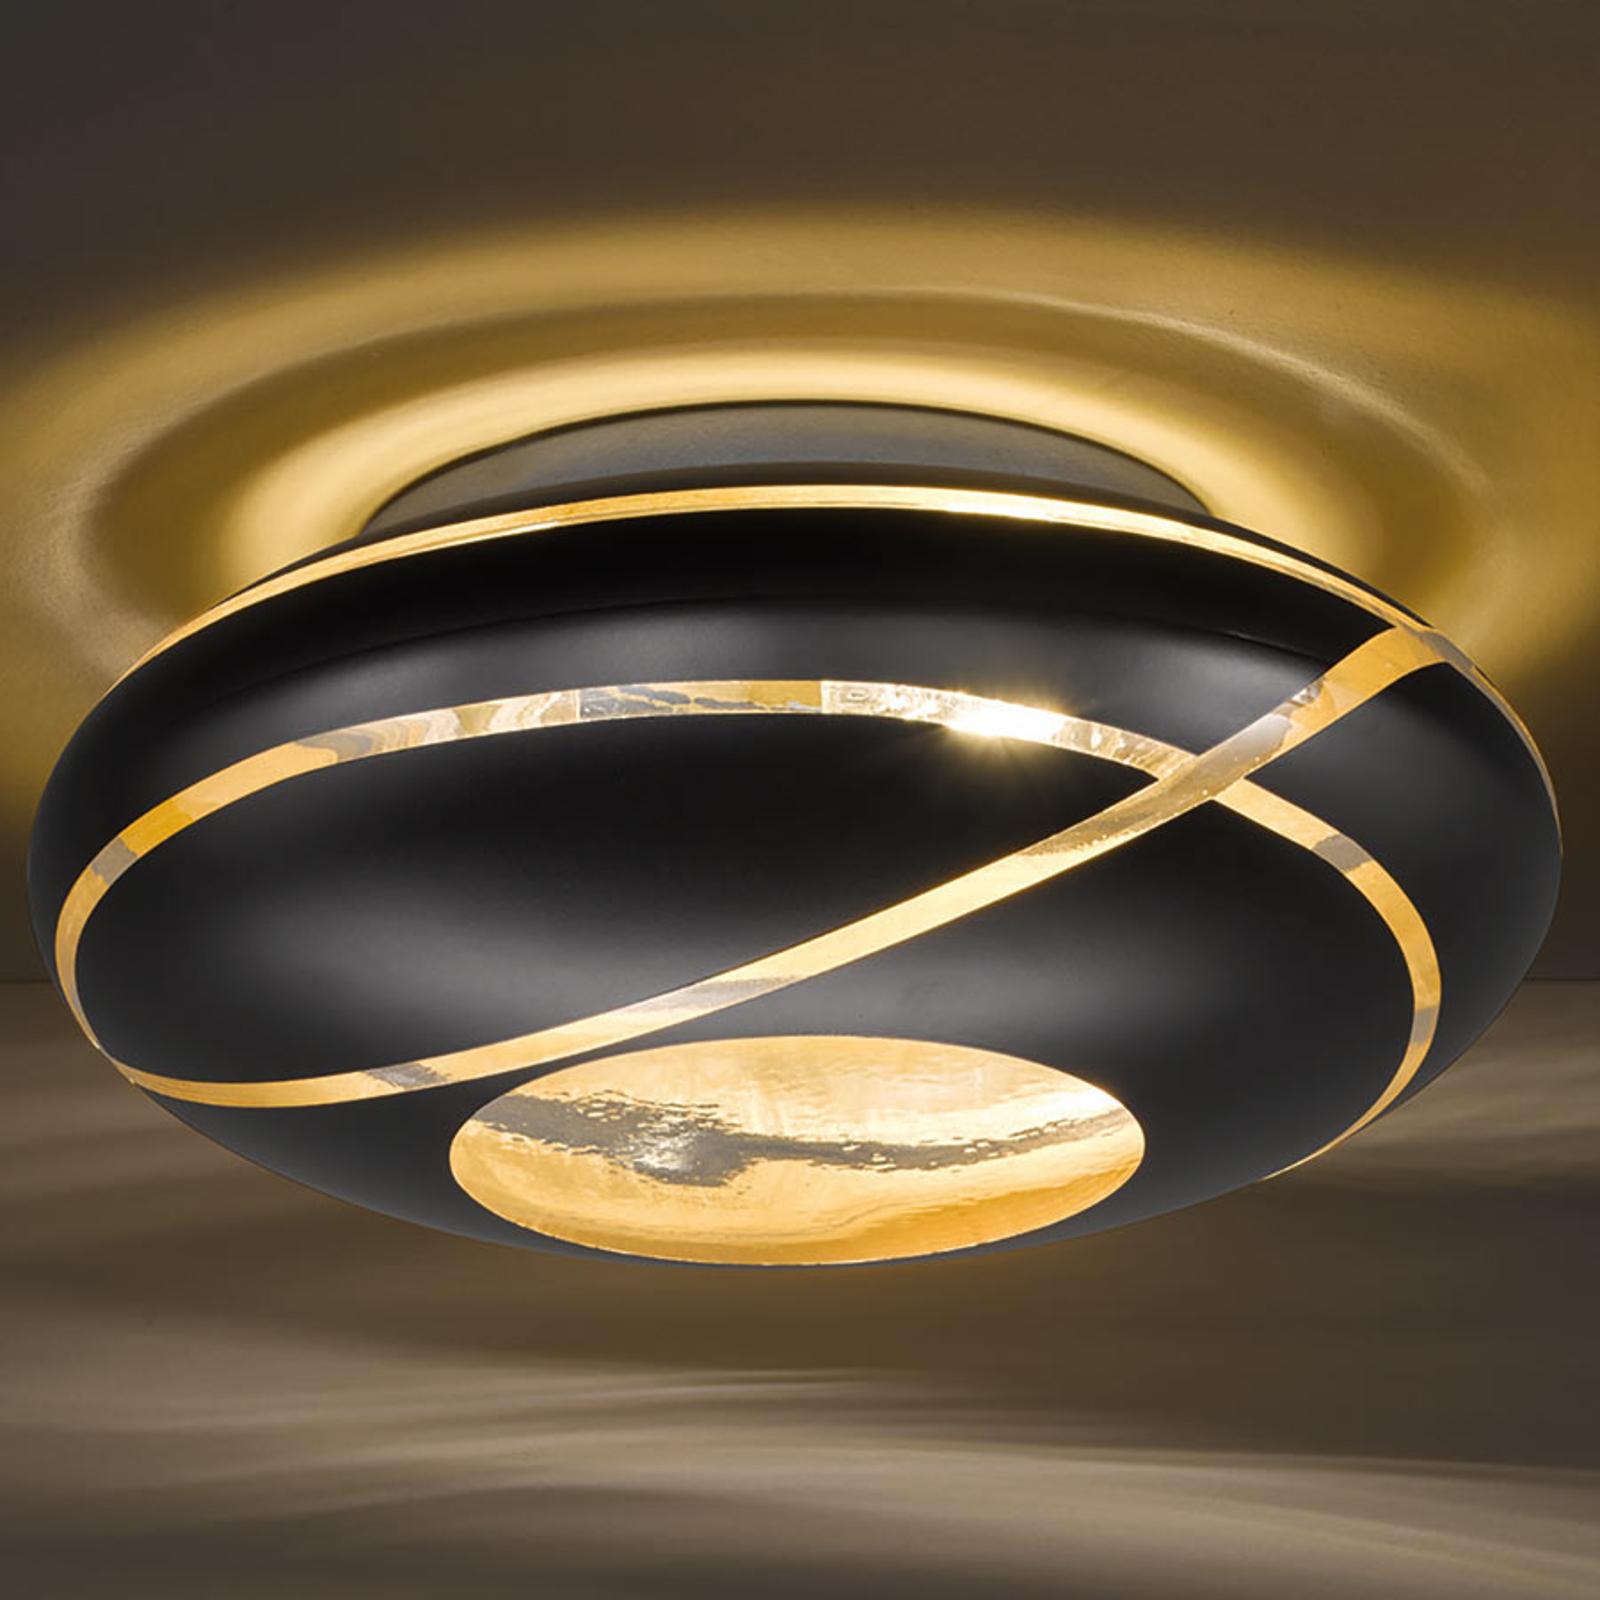 Glazen plafondlamp Farona in mat zwart en goud